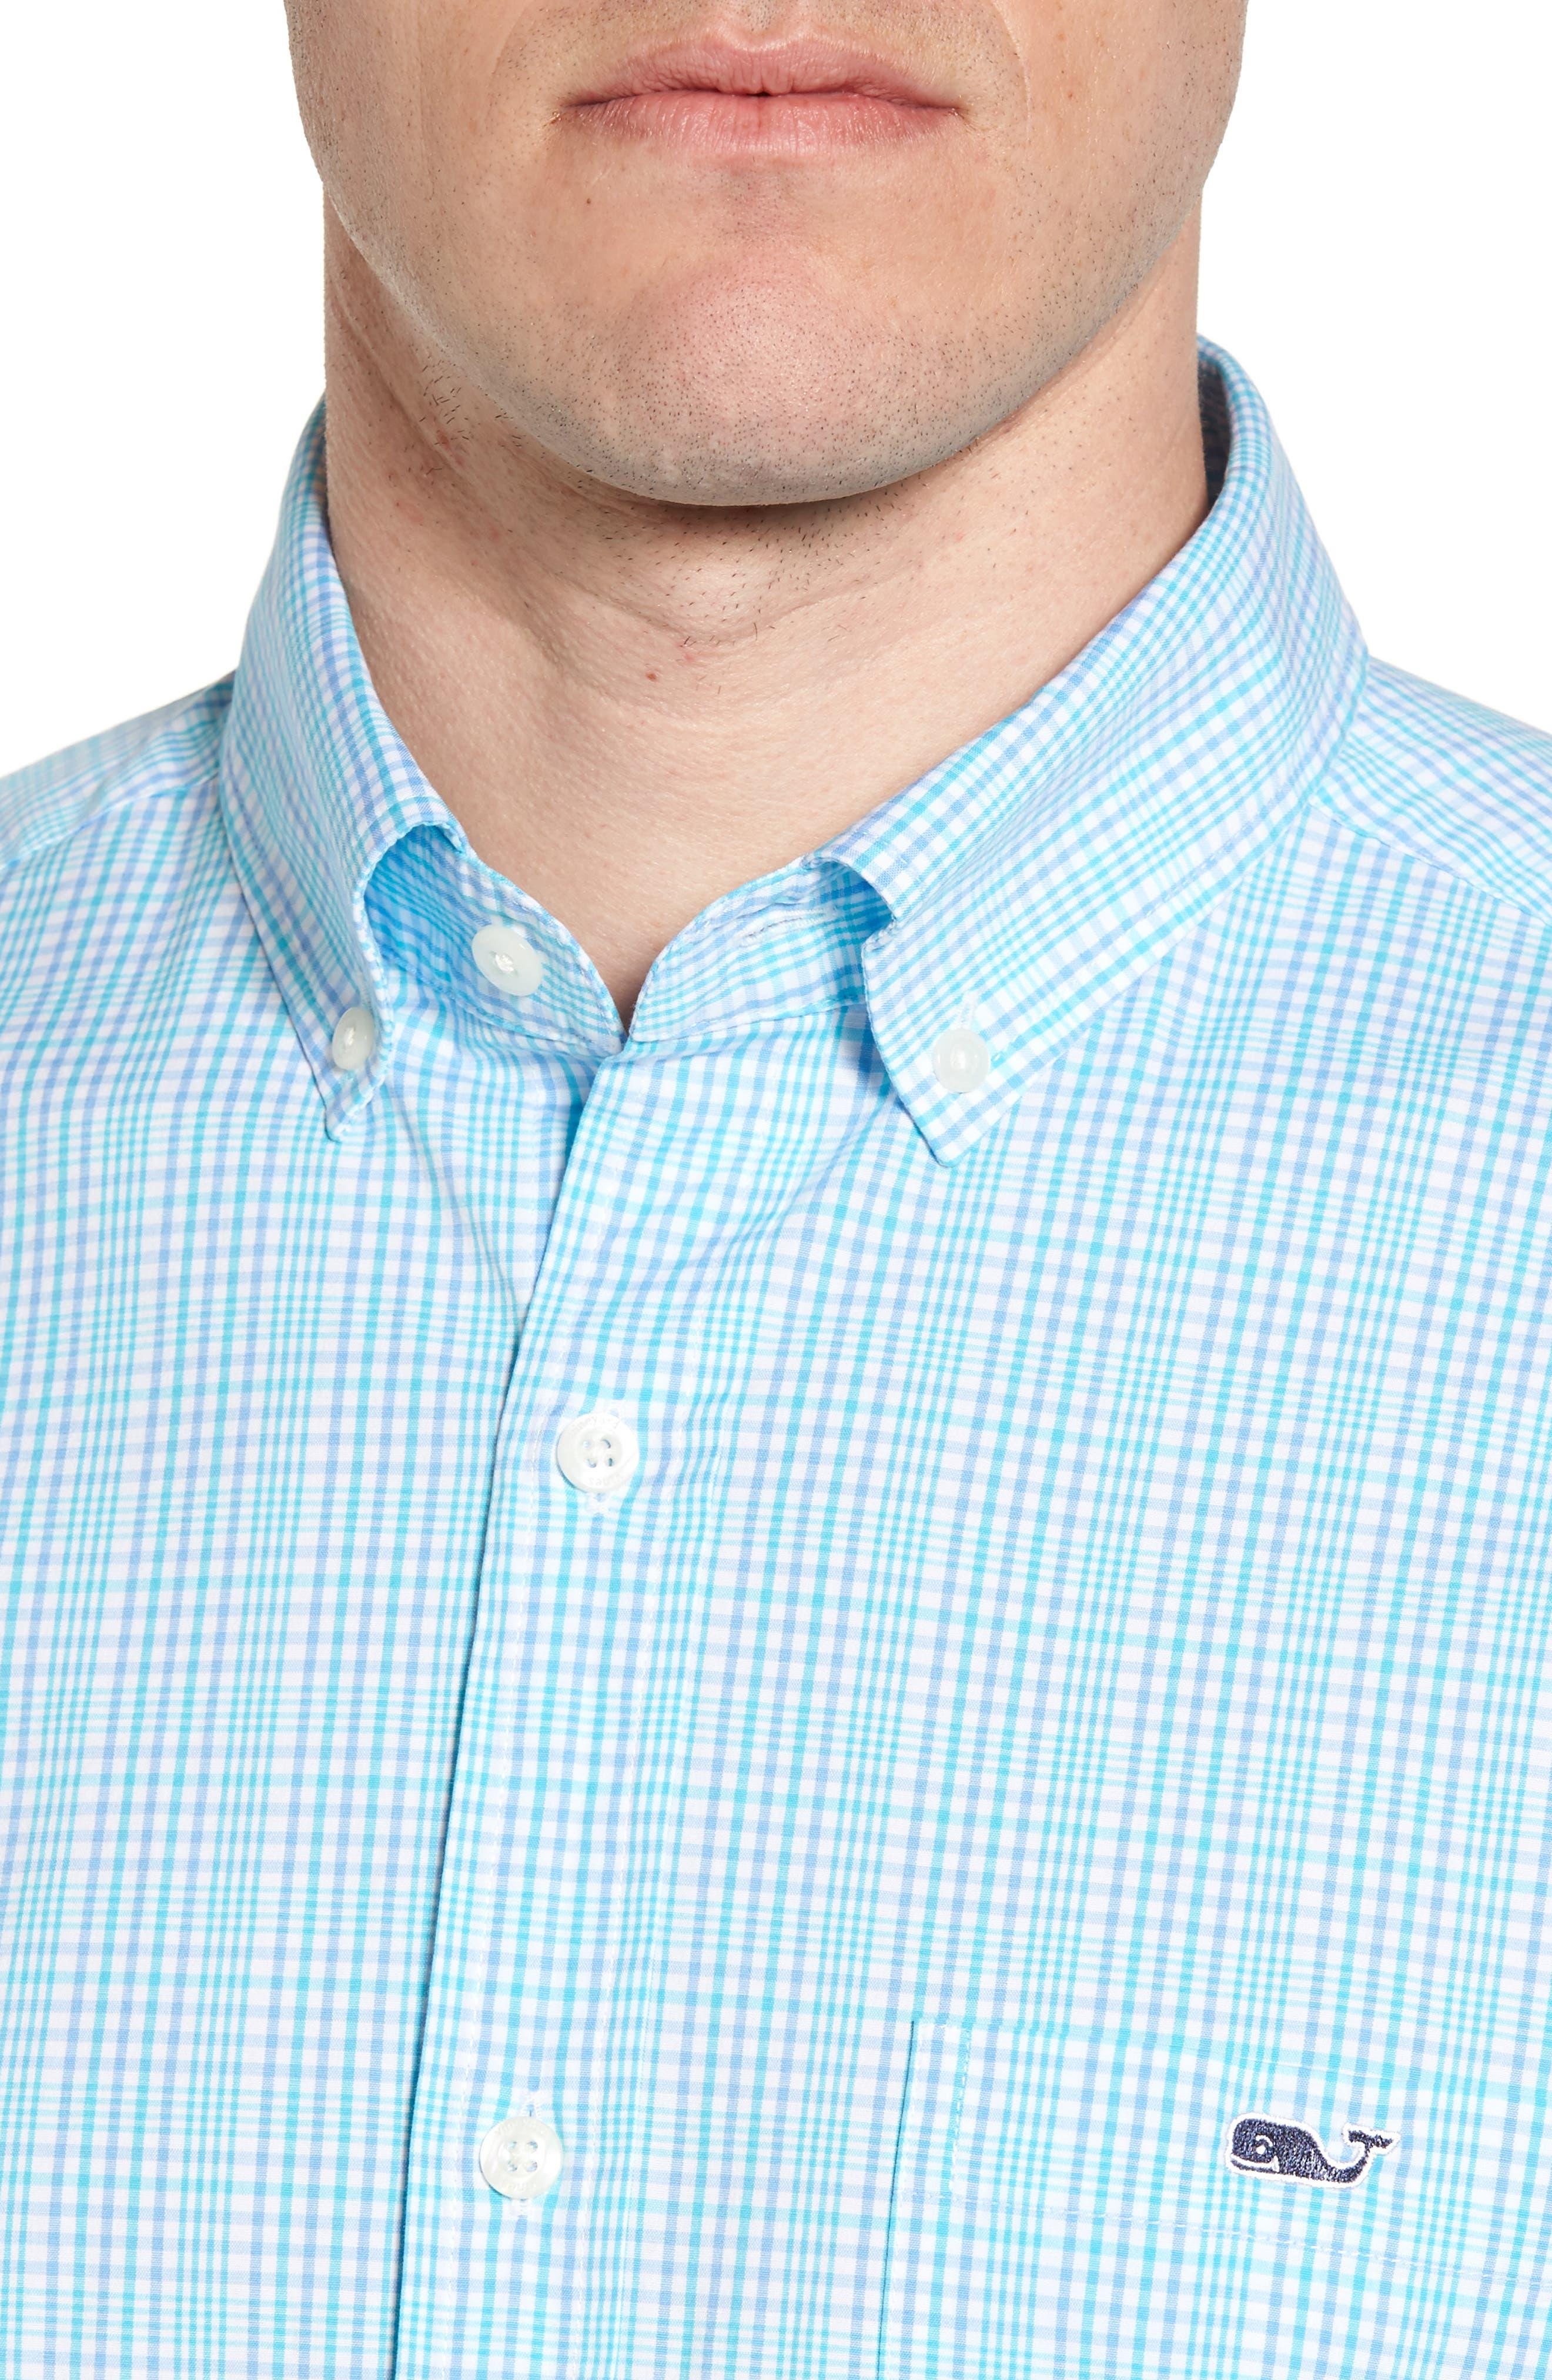 Rolling Harbor Classic Fit Plaid Sport Shirt,                             Alternate thumbnail 4, color,                             Turquoise